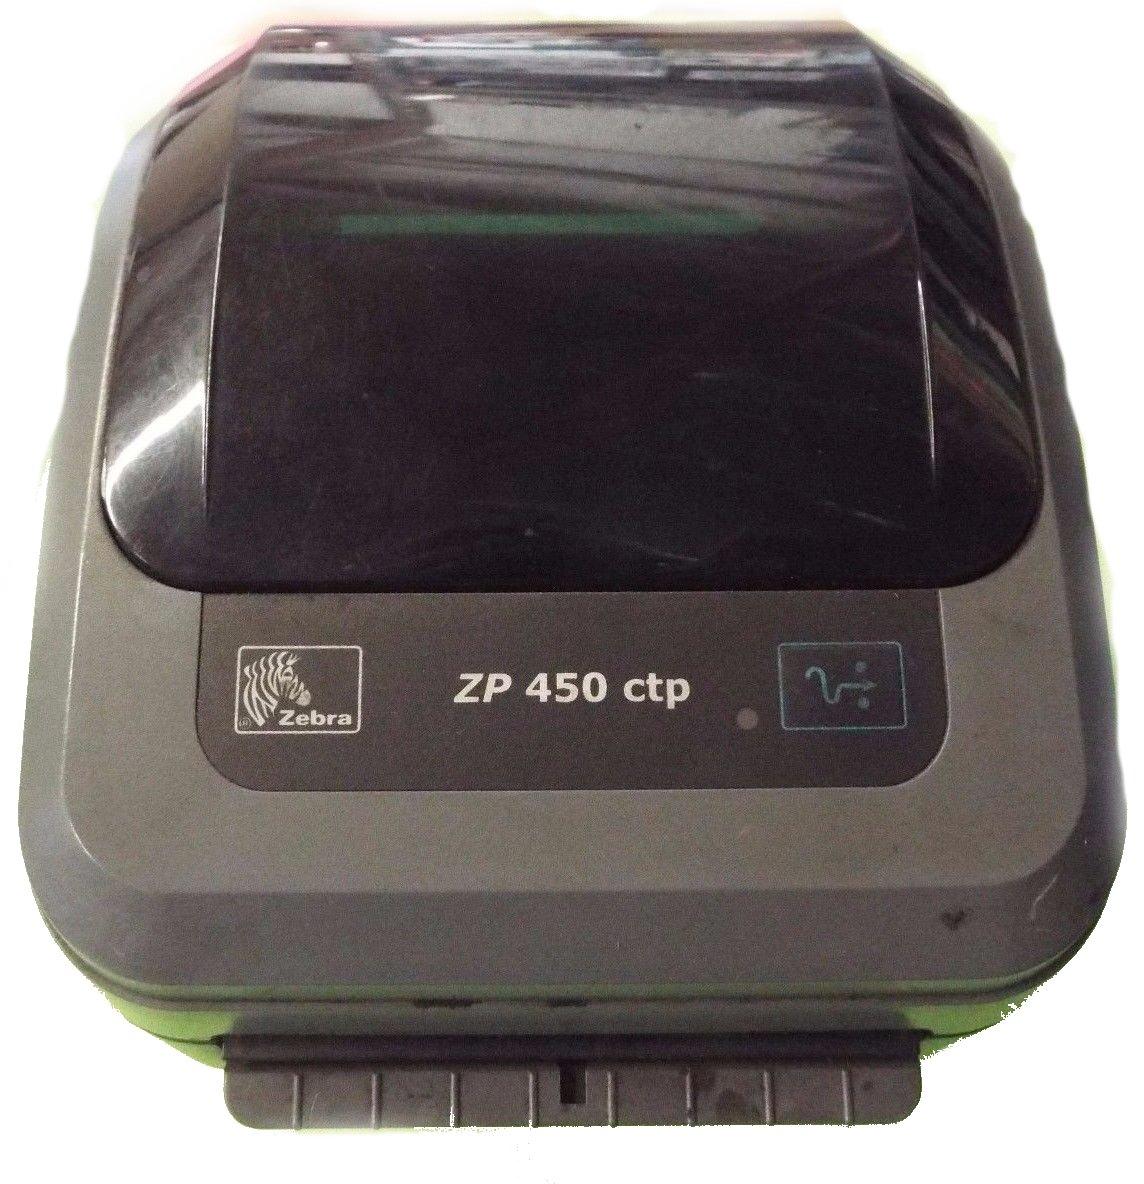 Zebra Technologies ZP-450 CTP Thermal Label Printer by Zebra Technologies